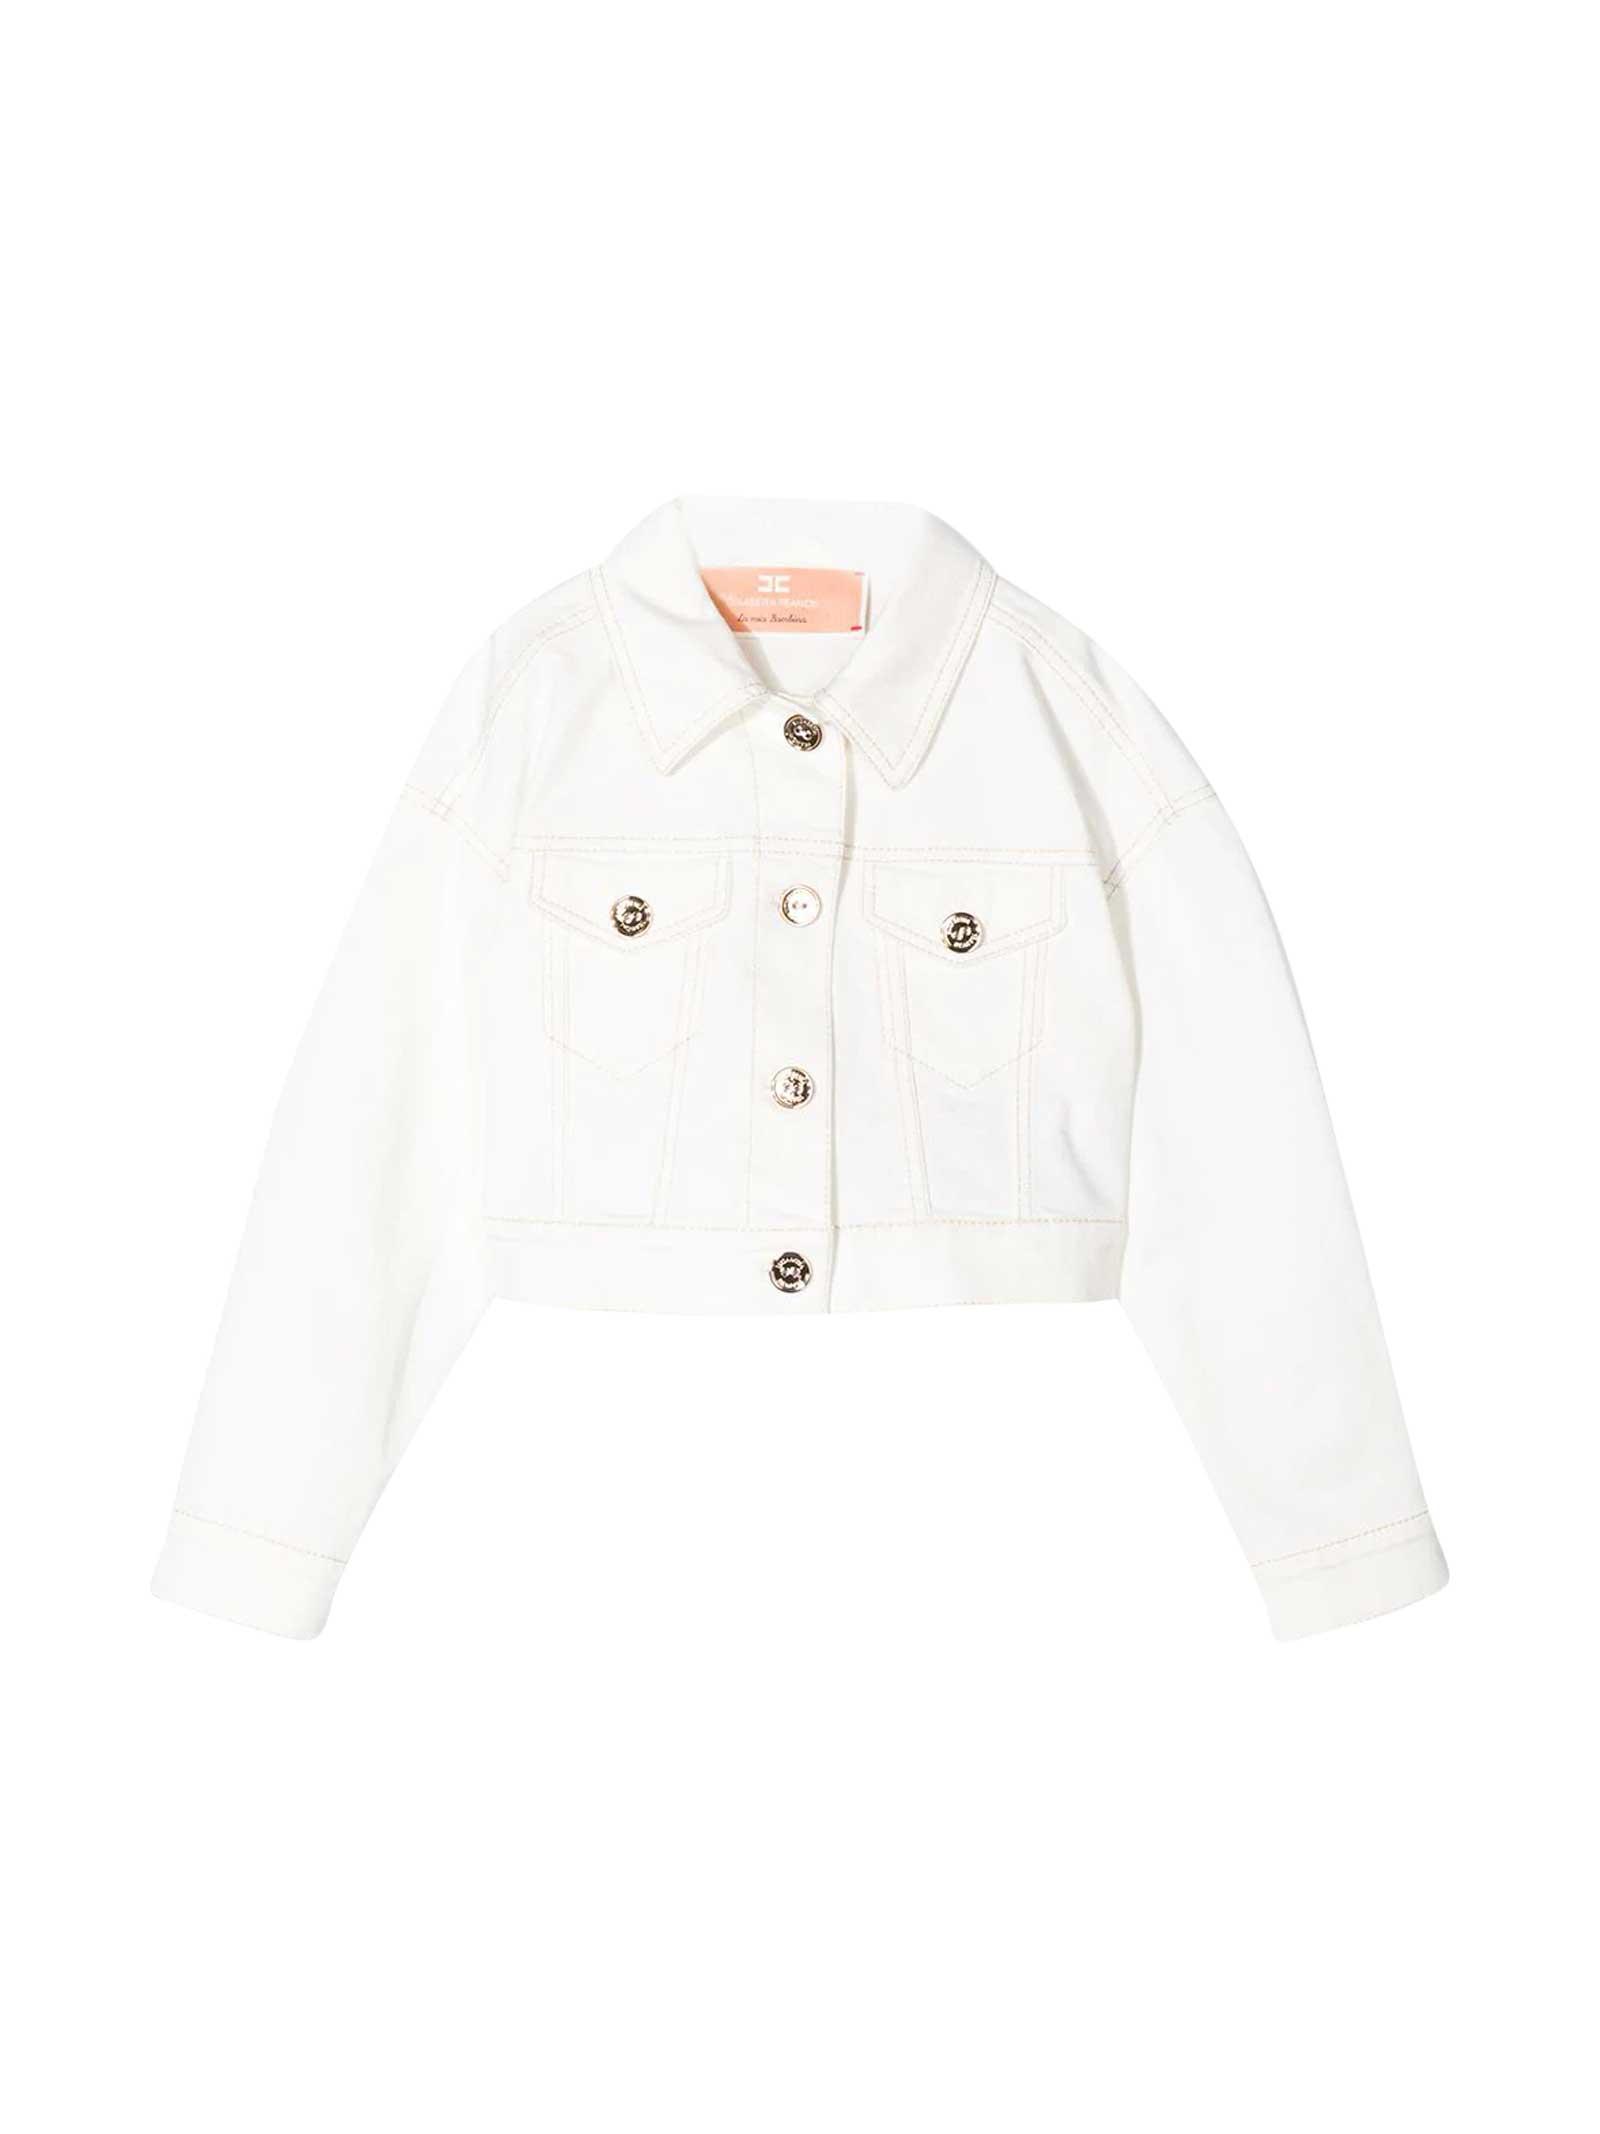 Elisabetta Franchi La Mia Bambina White Jacket